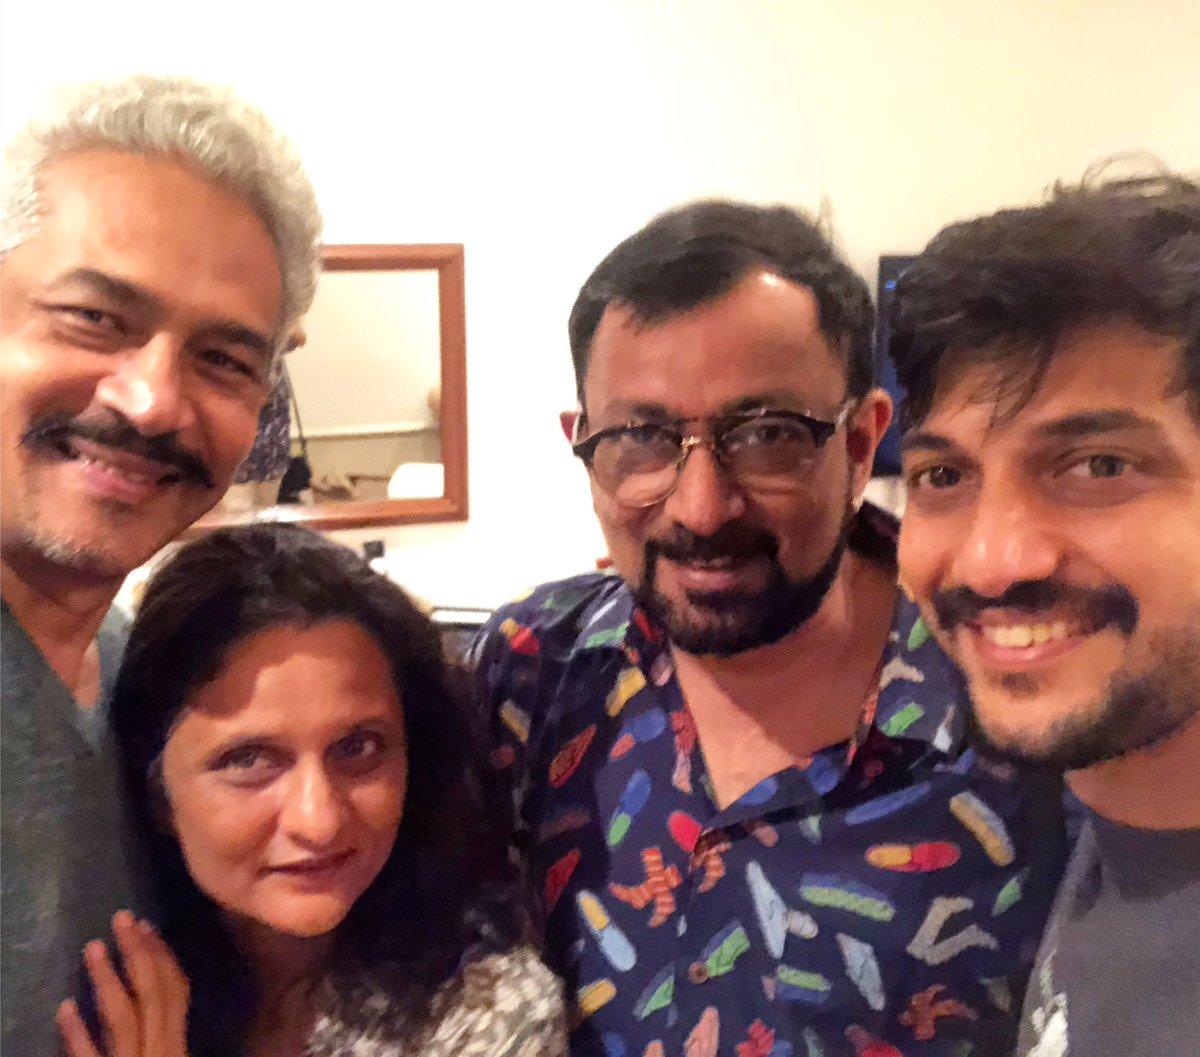 Replying to @Chemburstudio: Several takes & We managed a selfie 🤳  Atul Kulkarni Geetanjali Kulkarni Tejas Modak  #kochi